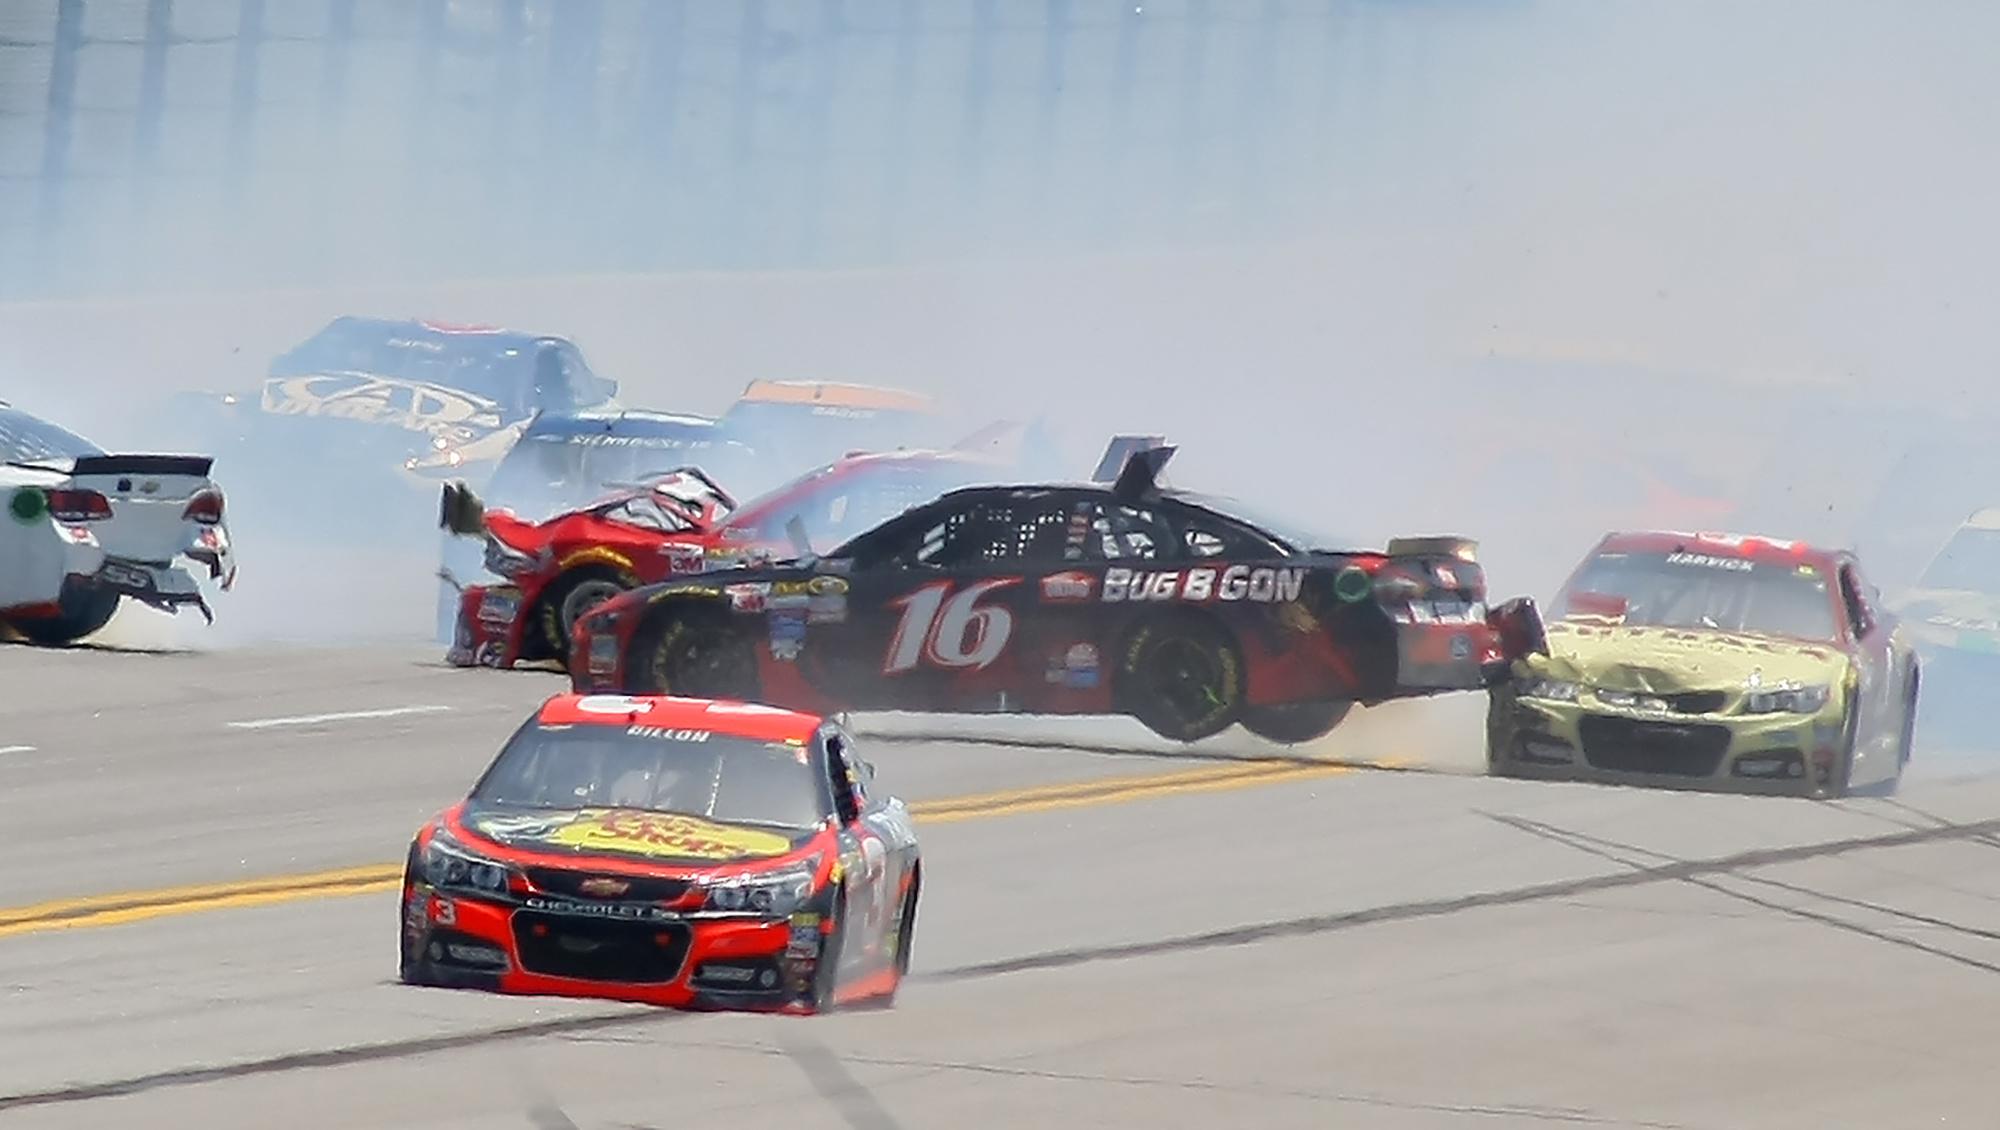 NASCAR briefly halts race after 15-car accident at Talladega